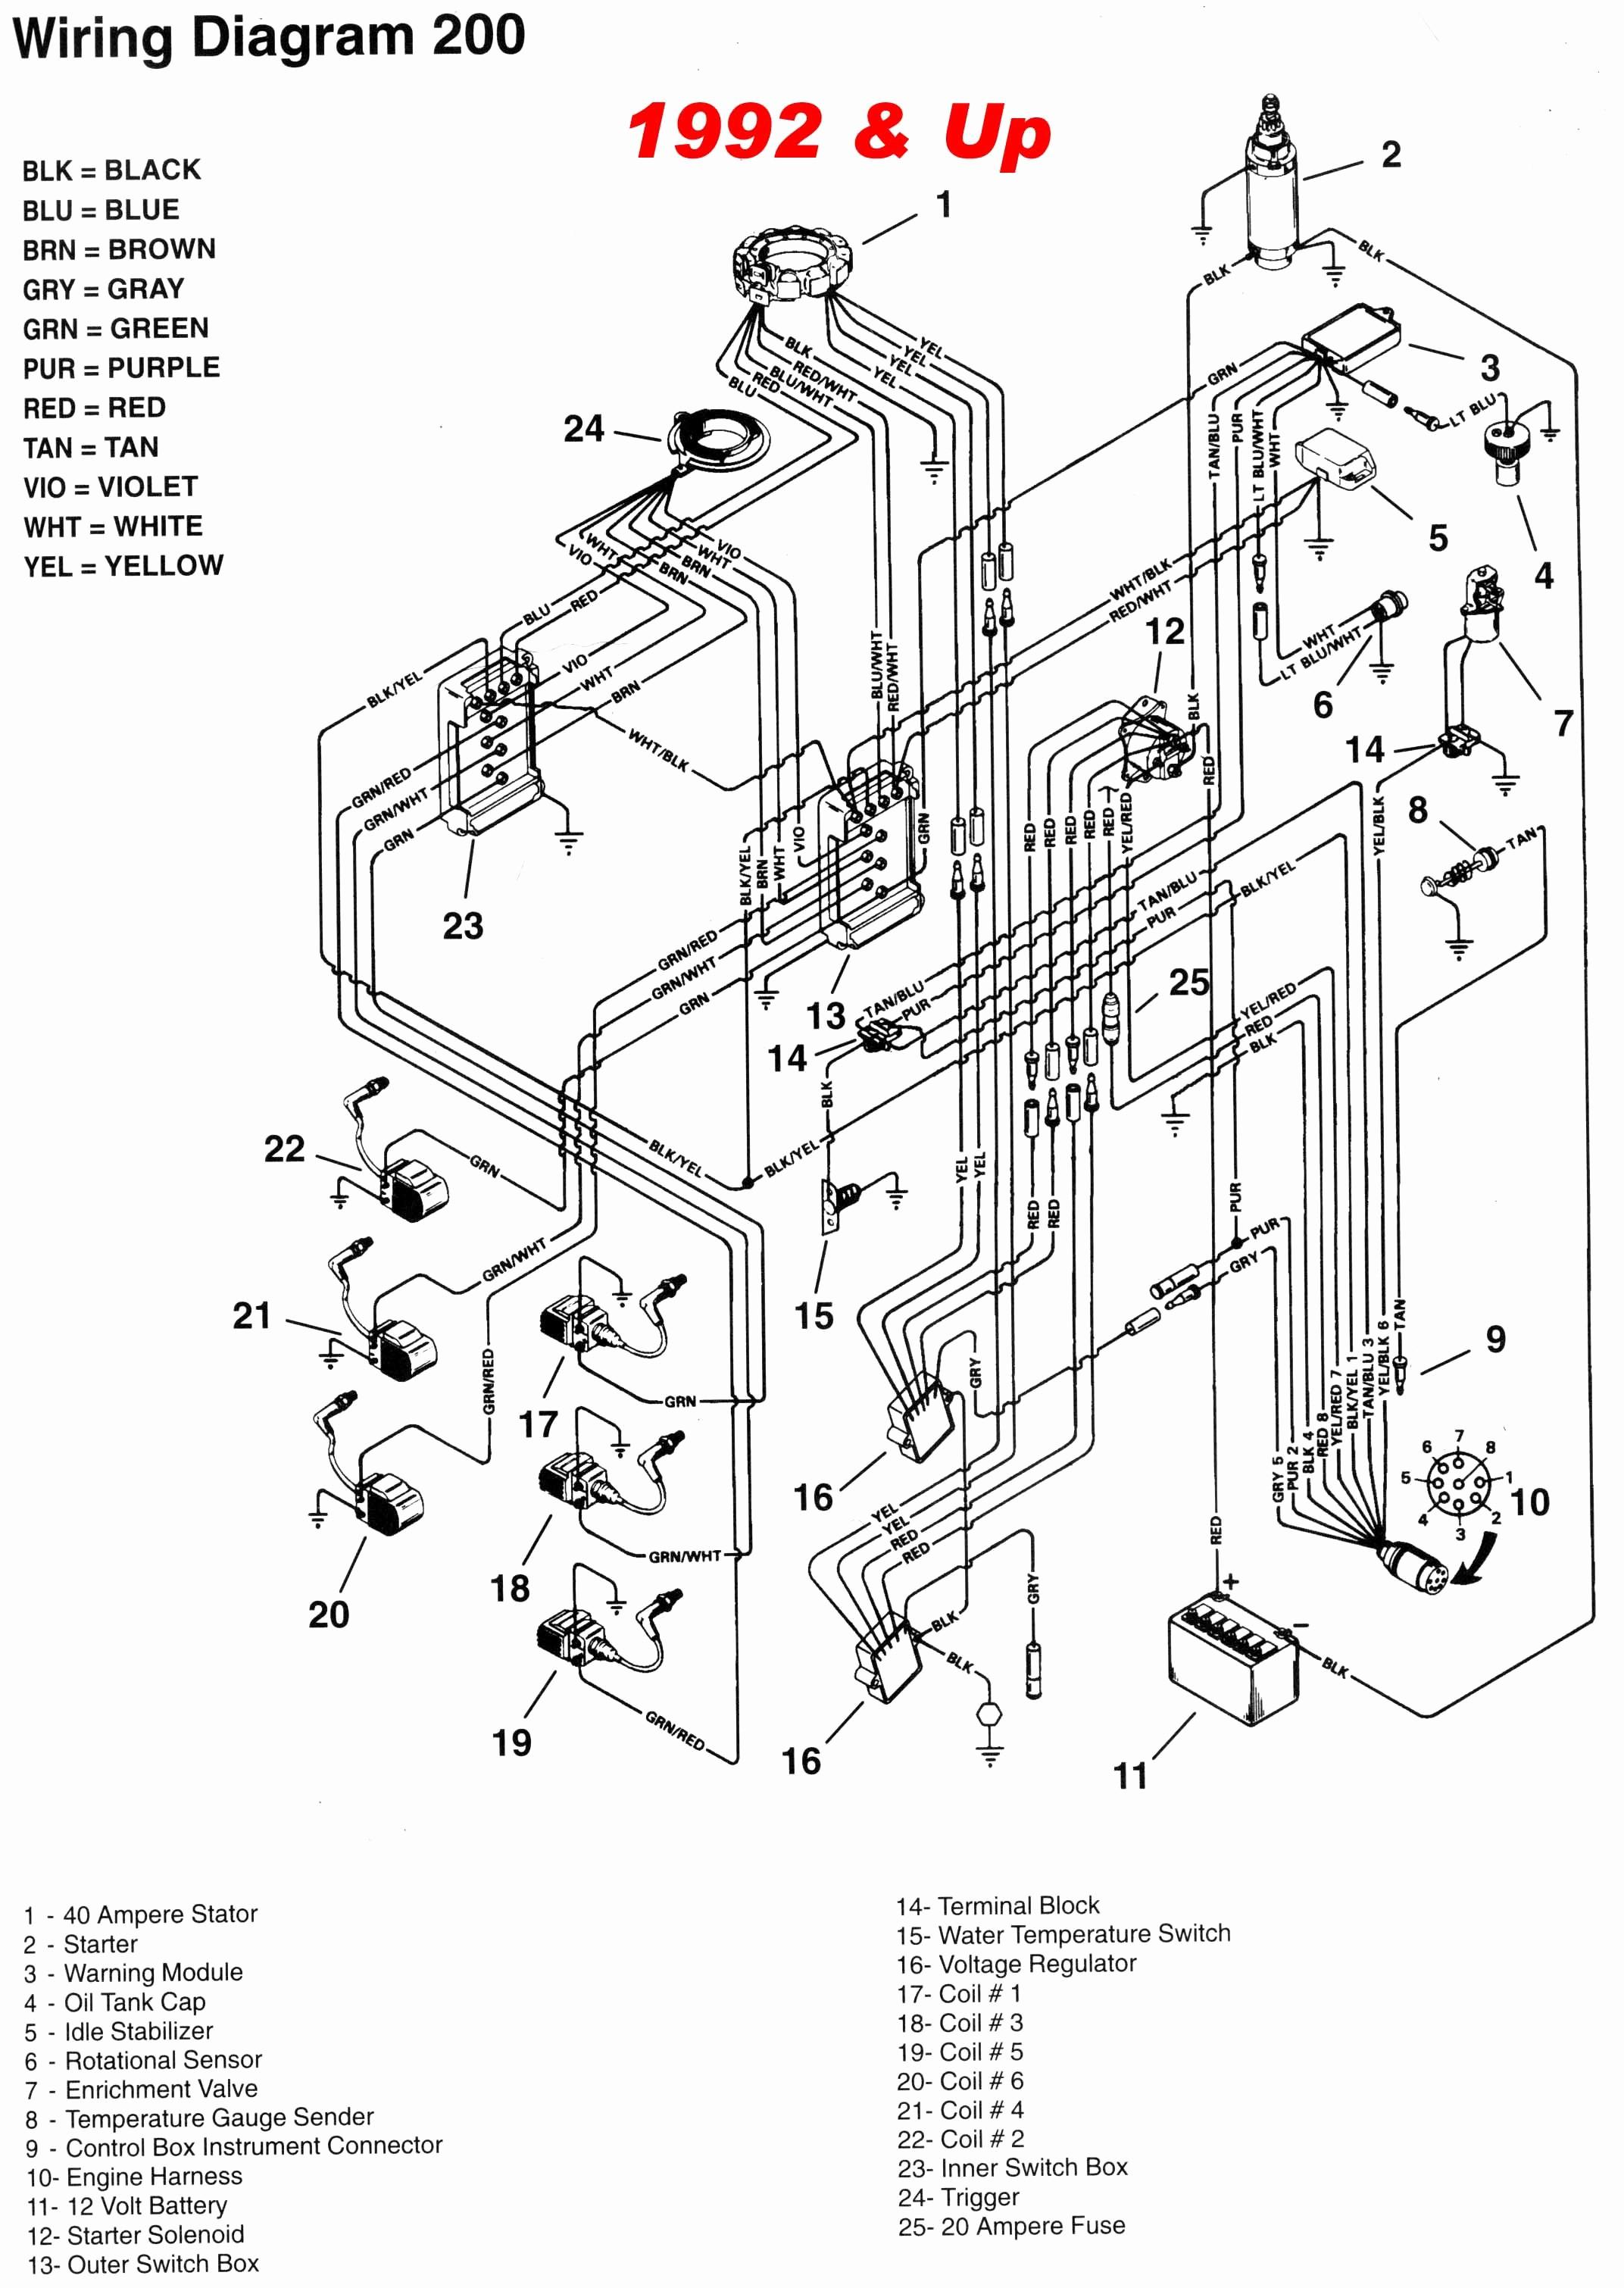 1995 Mercury Outboard 60 Hp Wiring Harness Diagram - Wiring ... on johnson motor controls, johnson motor starter motor, johnson motor generator, johnson motor parts, johnson motor steering, johnson switch diagram, ignition switch diagram, inboard motor diagram, johnson outboard motor diagram, johnson motor dimensions, johnson motor serial number, johnson parts diagram, johnson motor troubleshooting,